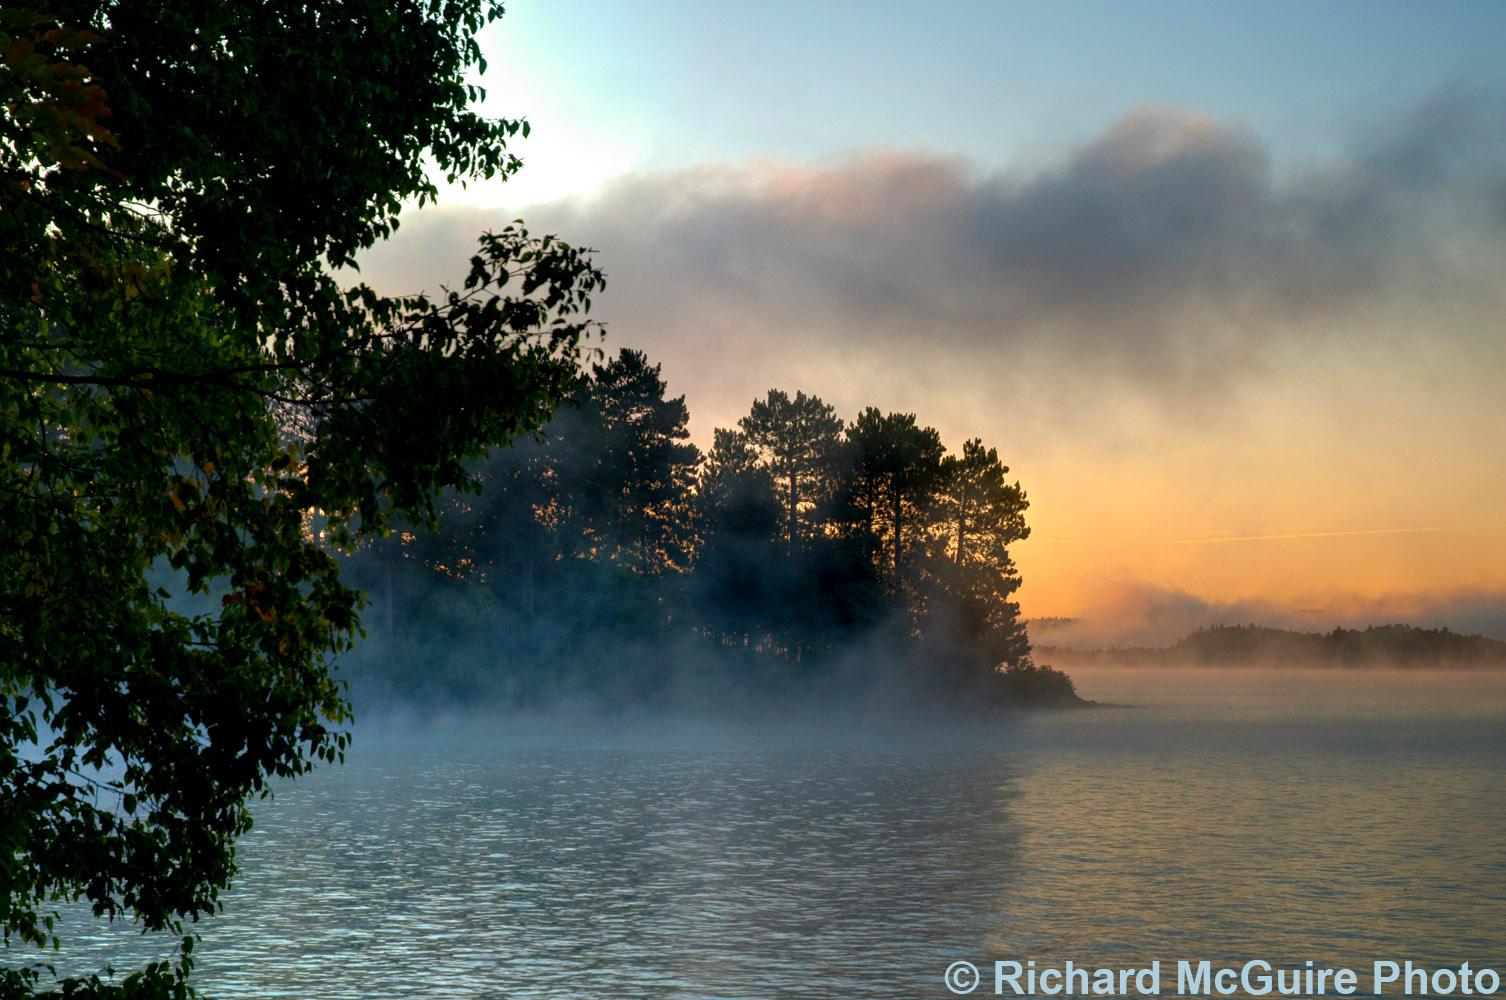 Montreal Richard Mcguire Photo